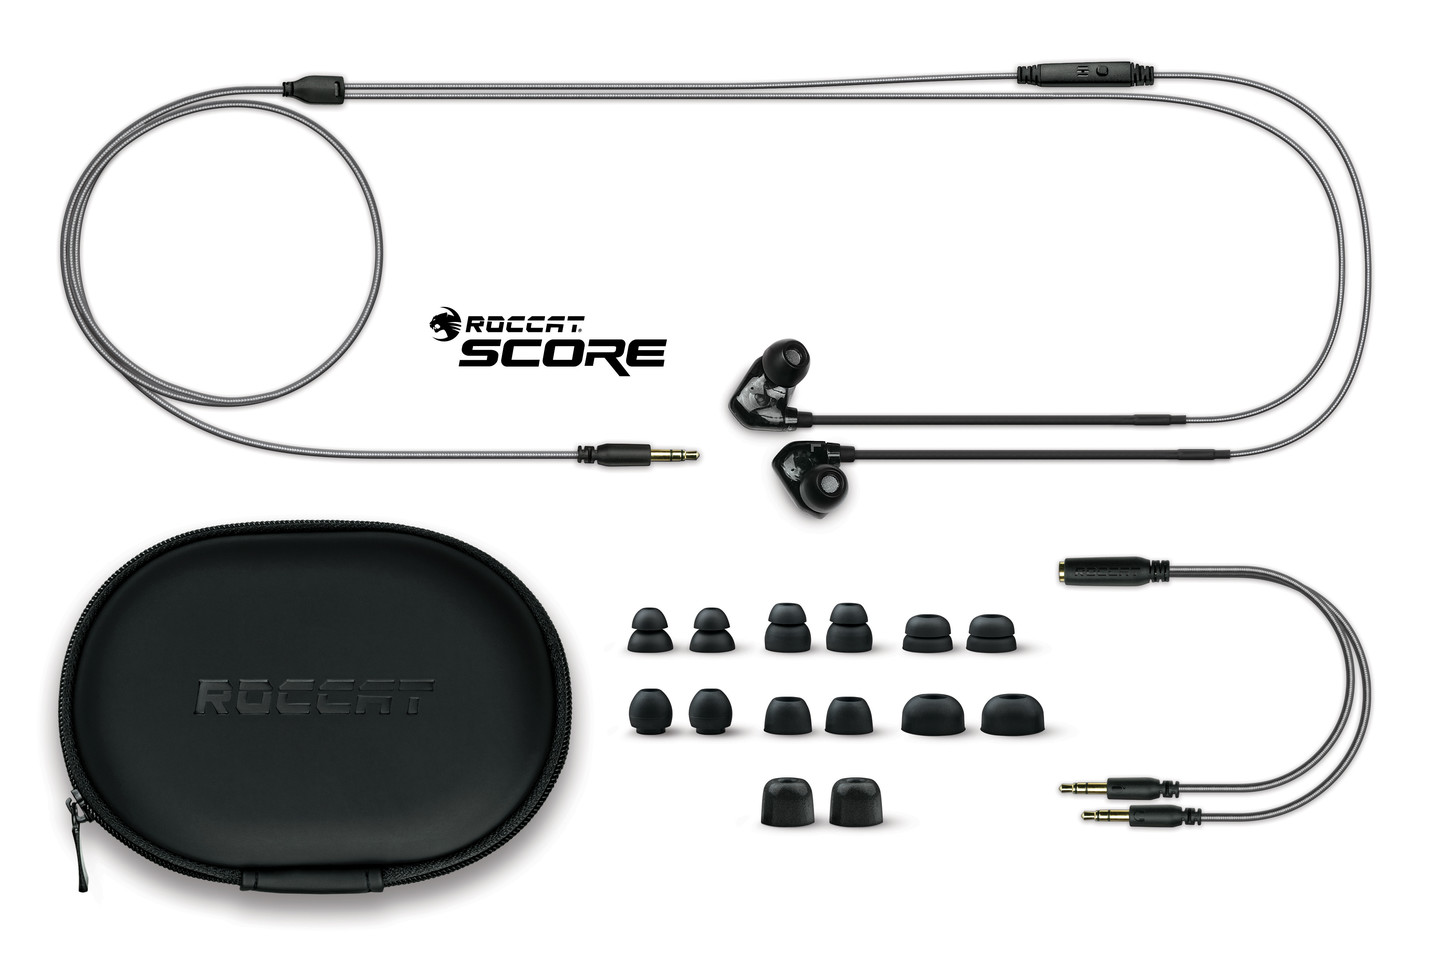 roccat-score-3